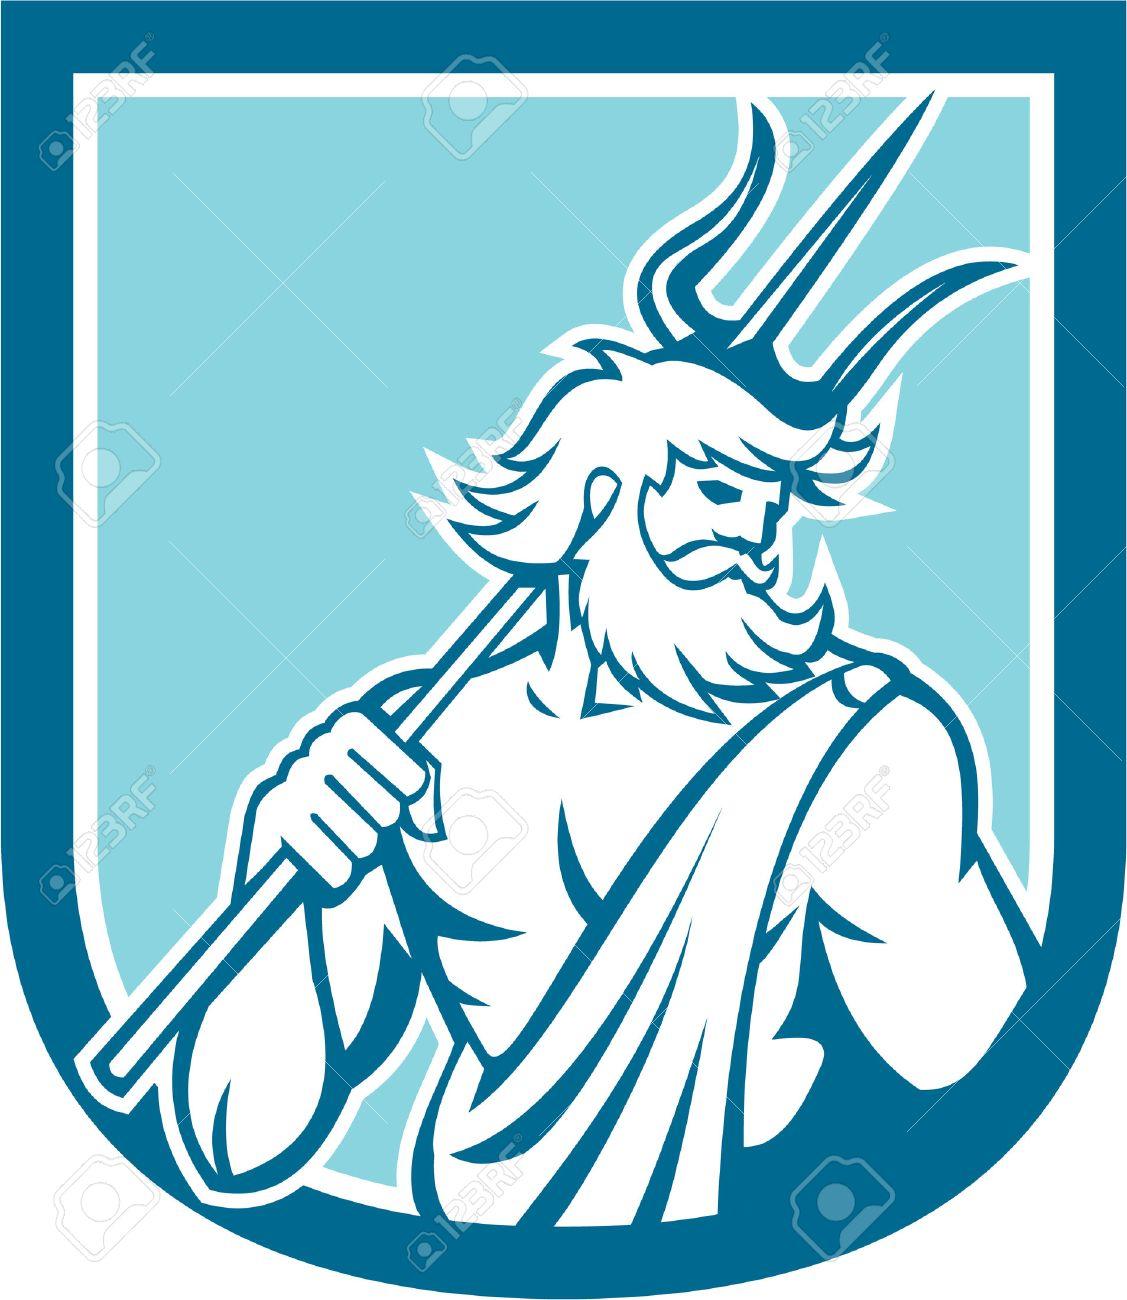 Illustration of Roman god of sea Neptune or Poseidon of Greek mythology holding a trident set inside shield crest on isolated background done in retro style Stock Vector - 31077542